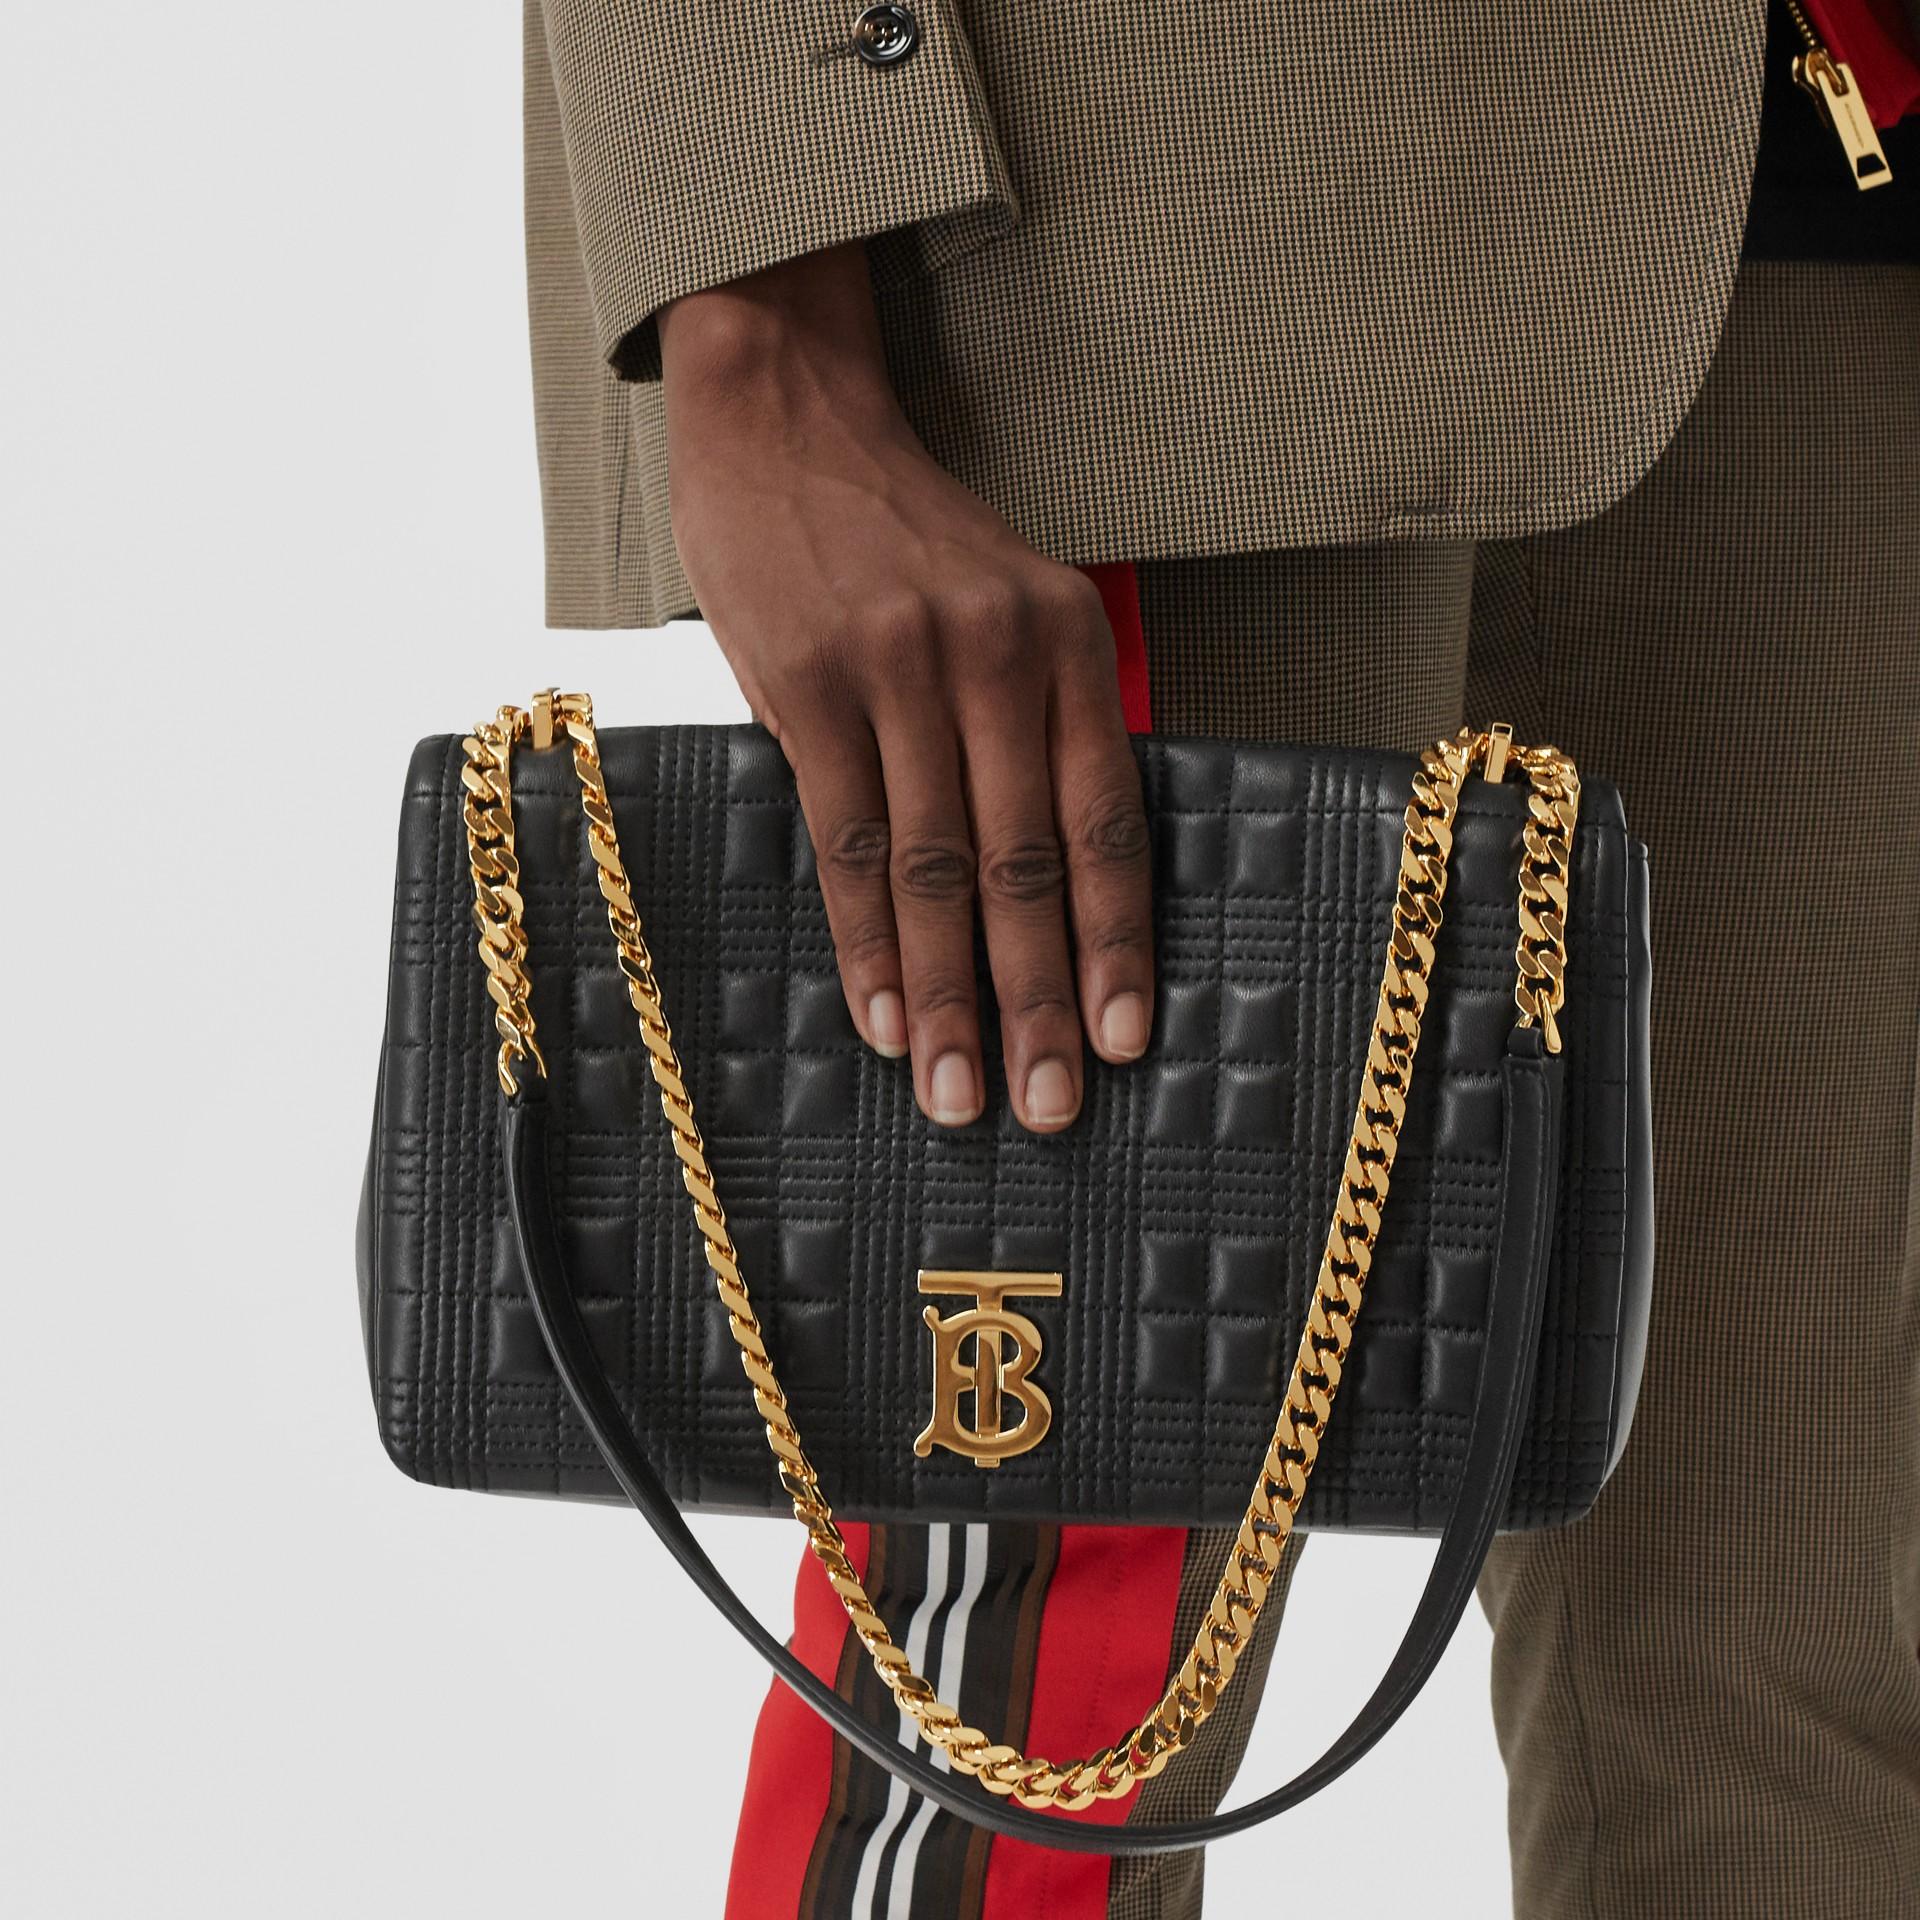 Medium Quilted Lambskin Lola Bag in Black - Women   Burberry - gallery image 2